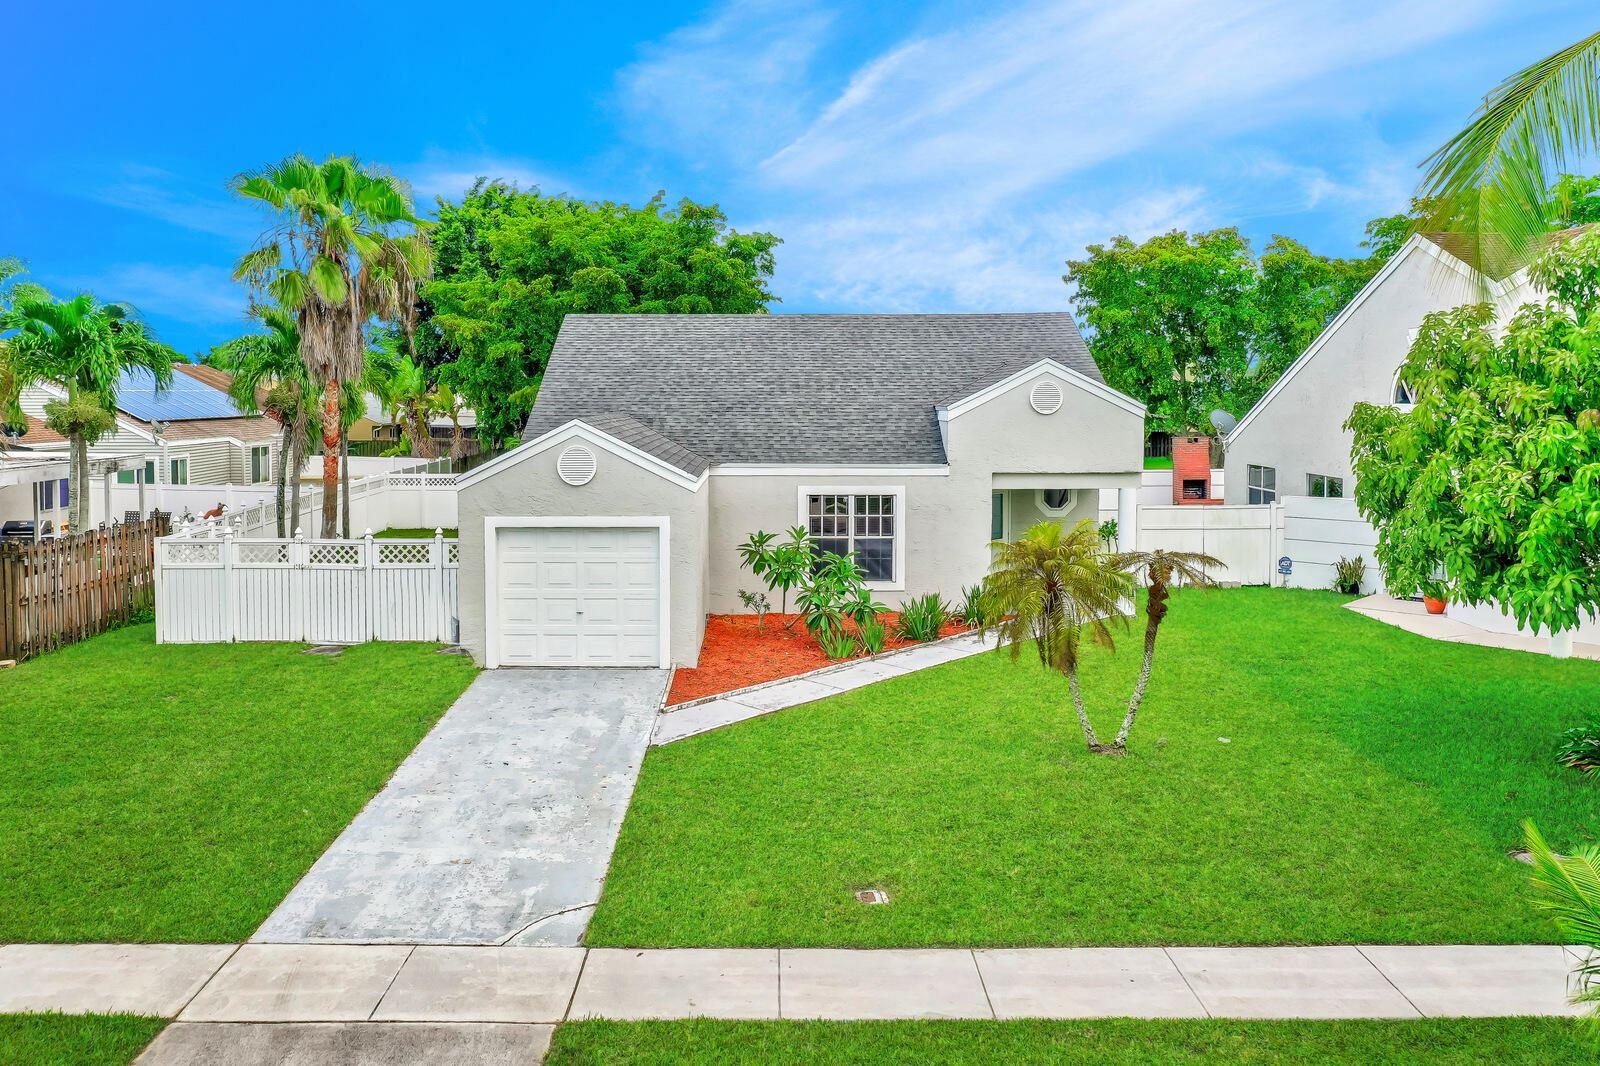 8379 Dynasty Drive, Boca Raton, FL 33433 - MLS#: RX-10734105